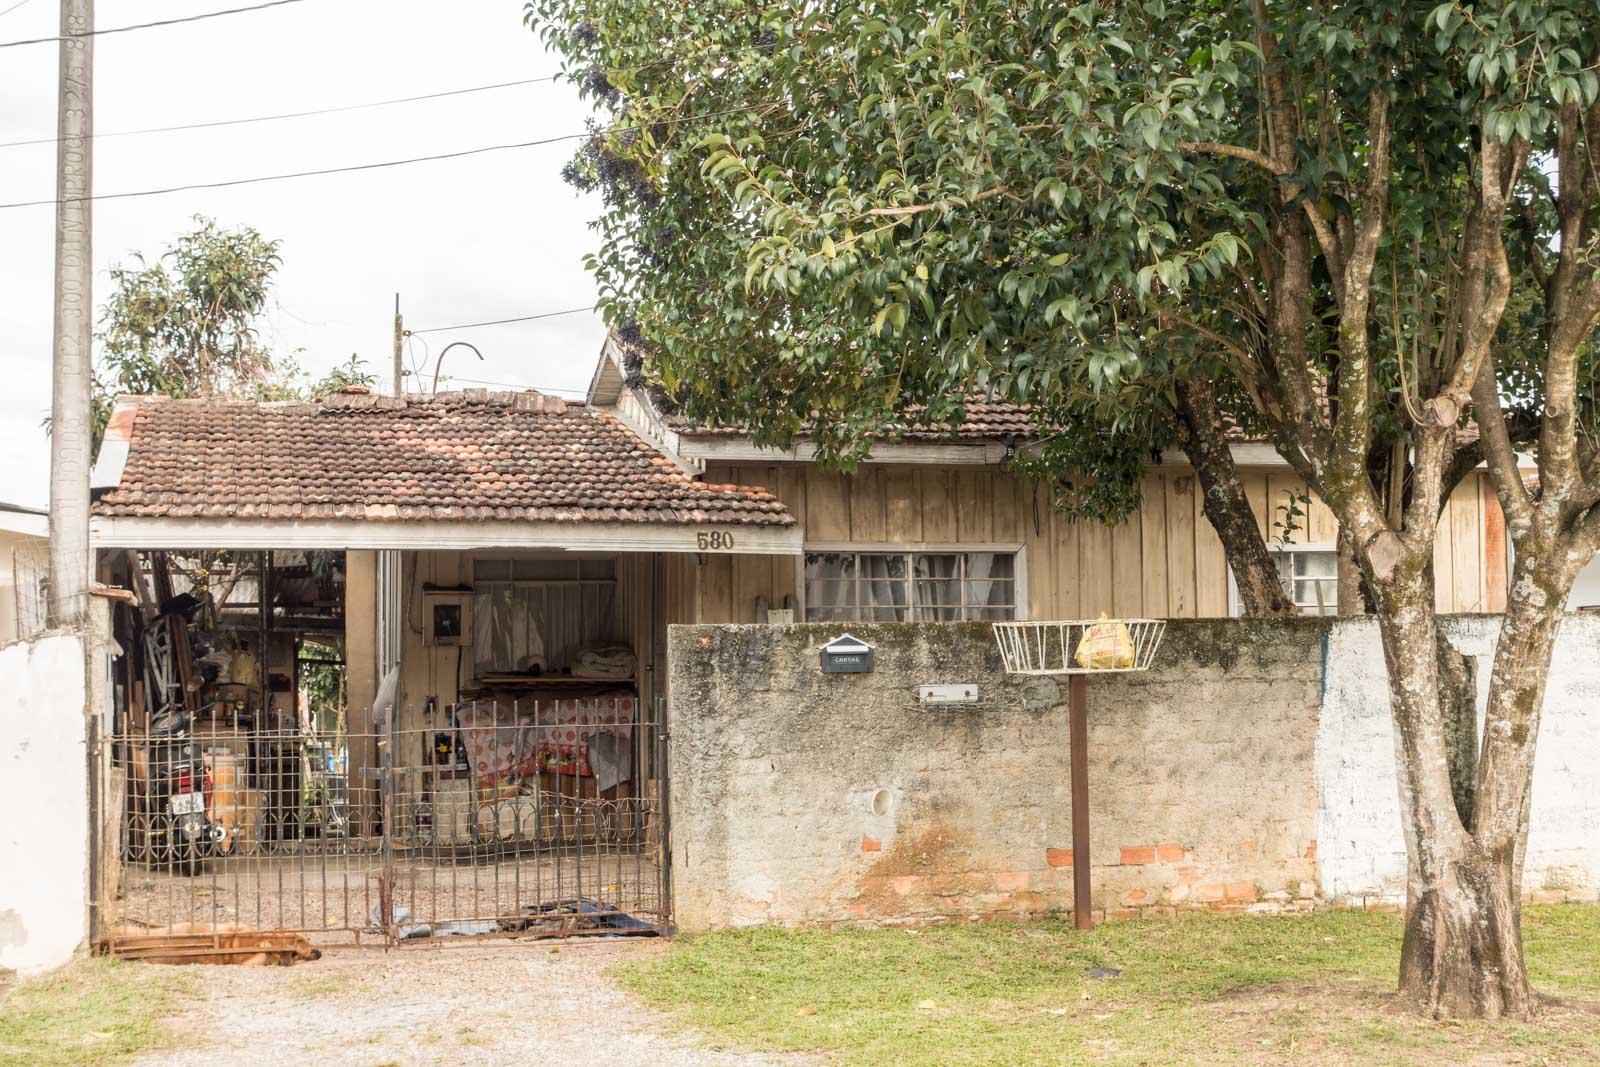 Fotografando Curitiba: Outra casa de madeira #946137 1600x1067